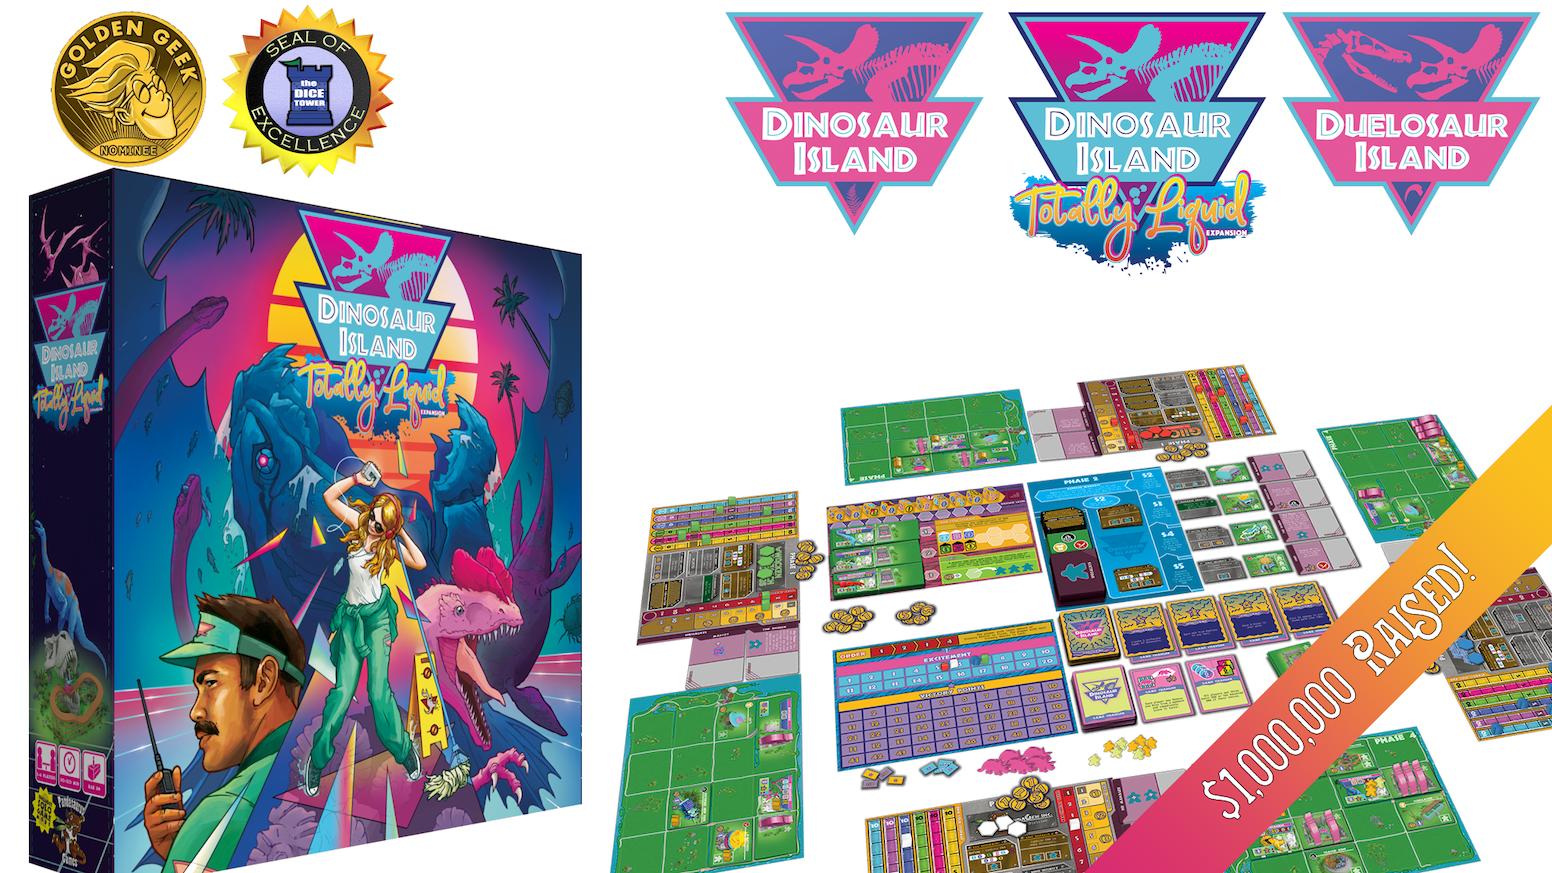 Dinosaur Island: Back from Extinction.   Dinosaur Island X-treme Edition, Totally Liquid Expansion and Duelosaur Island 2 player game!